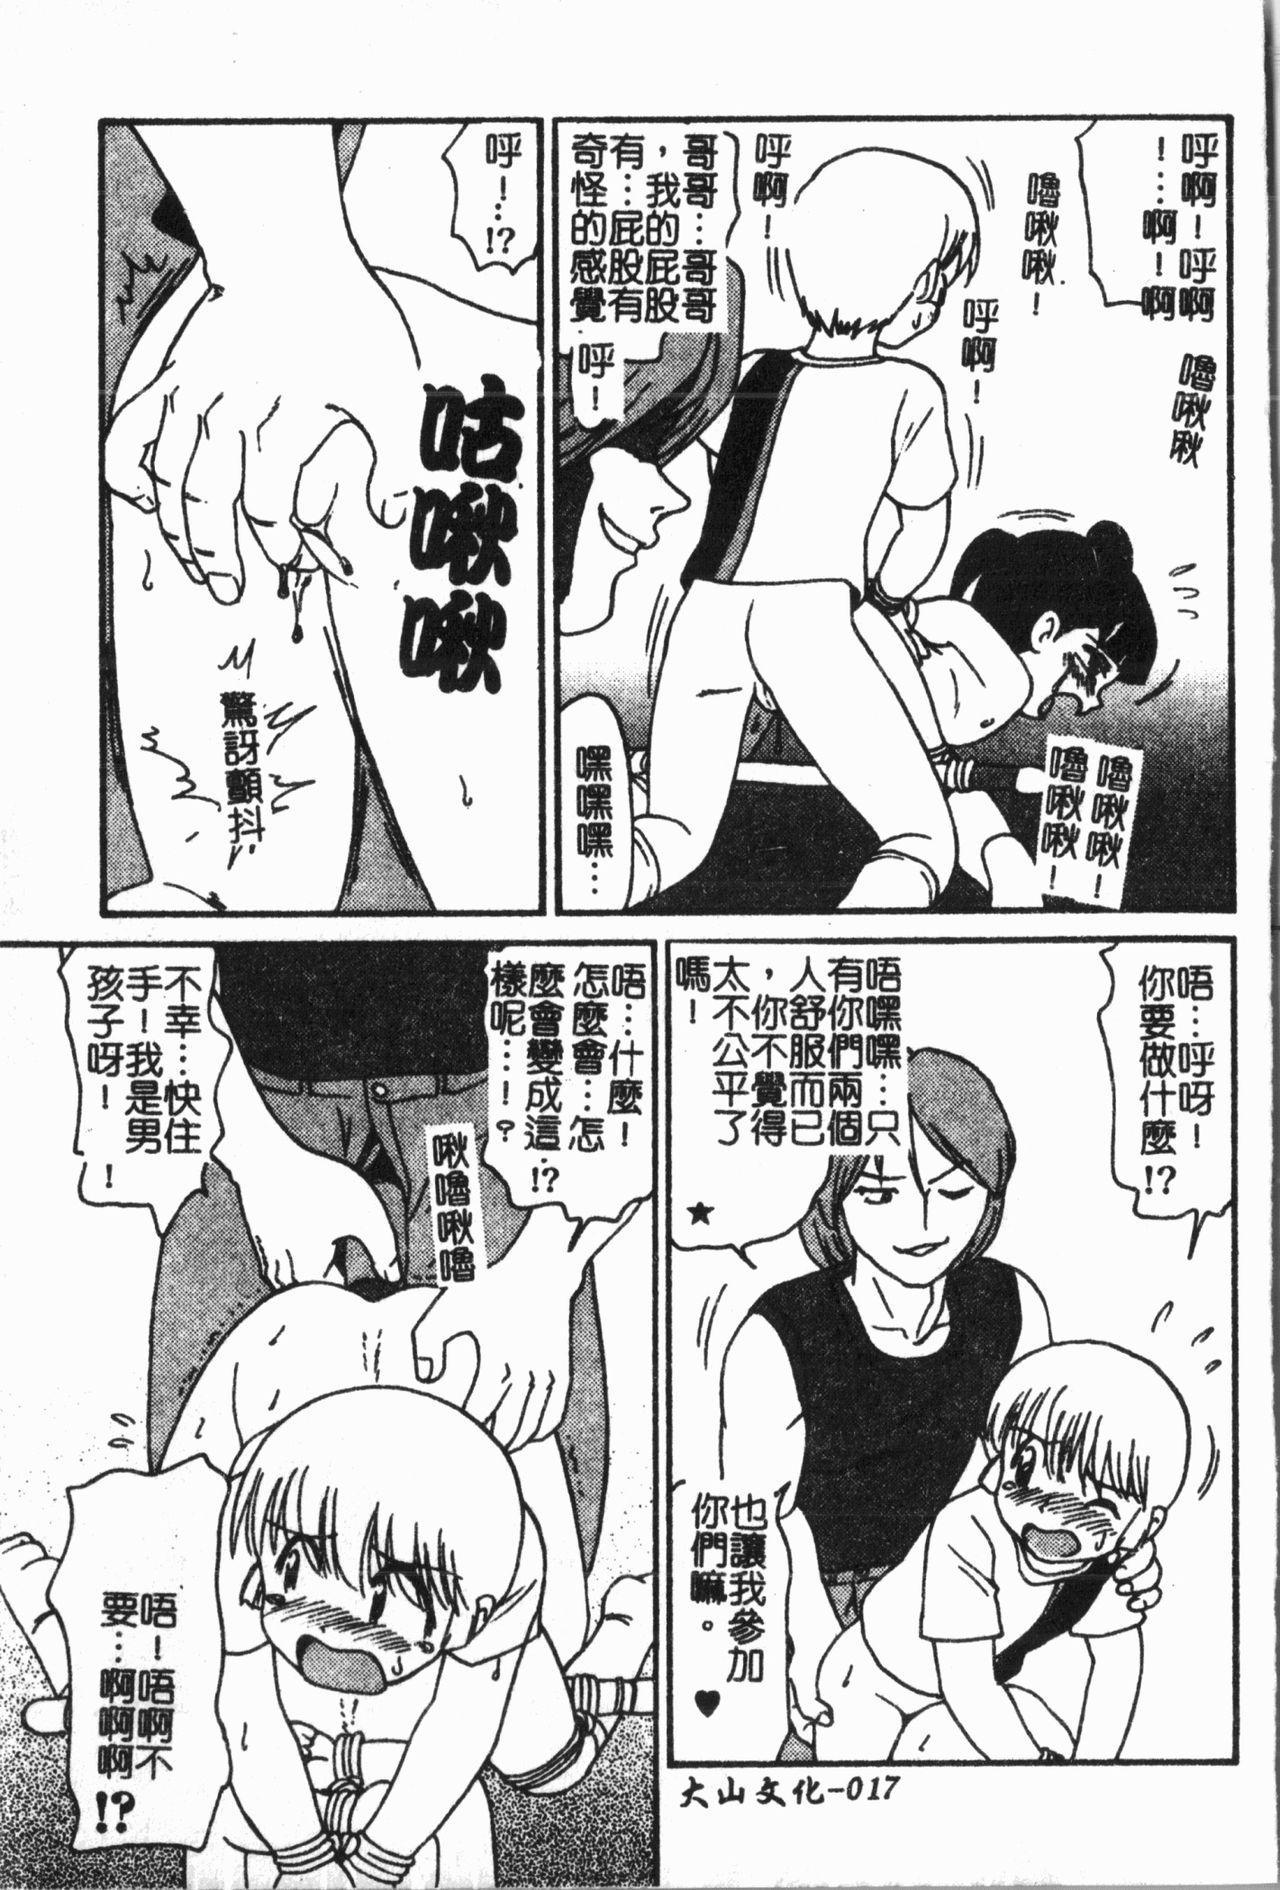 Imouto Koishi 6 19